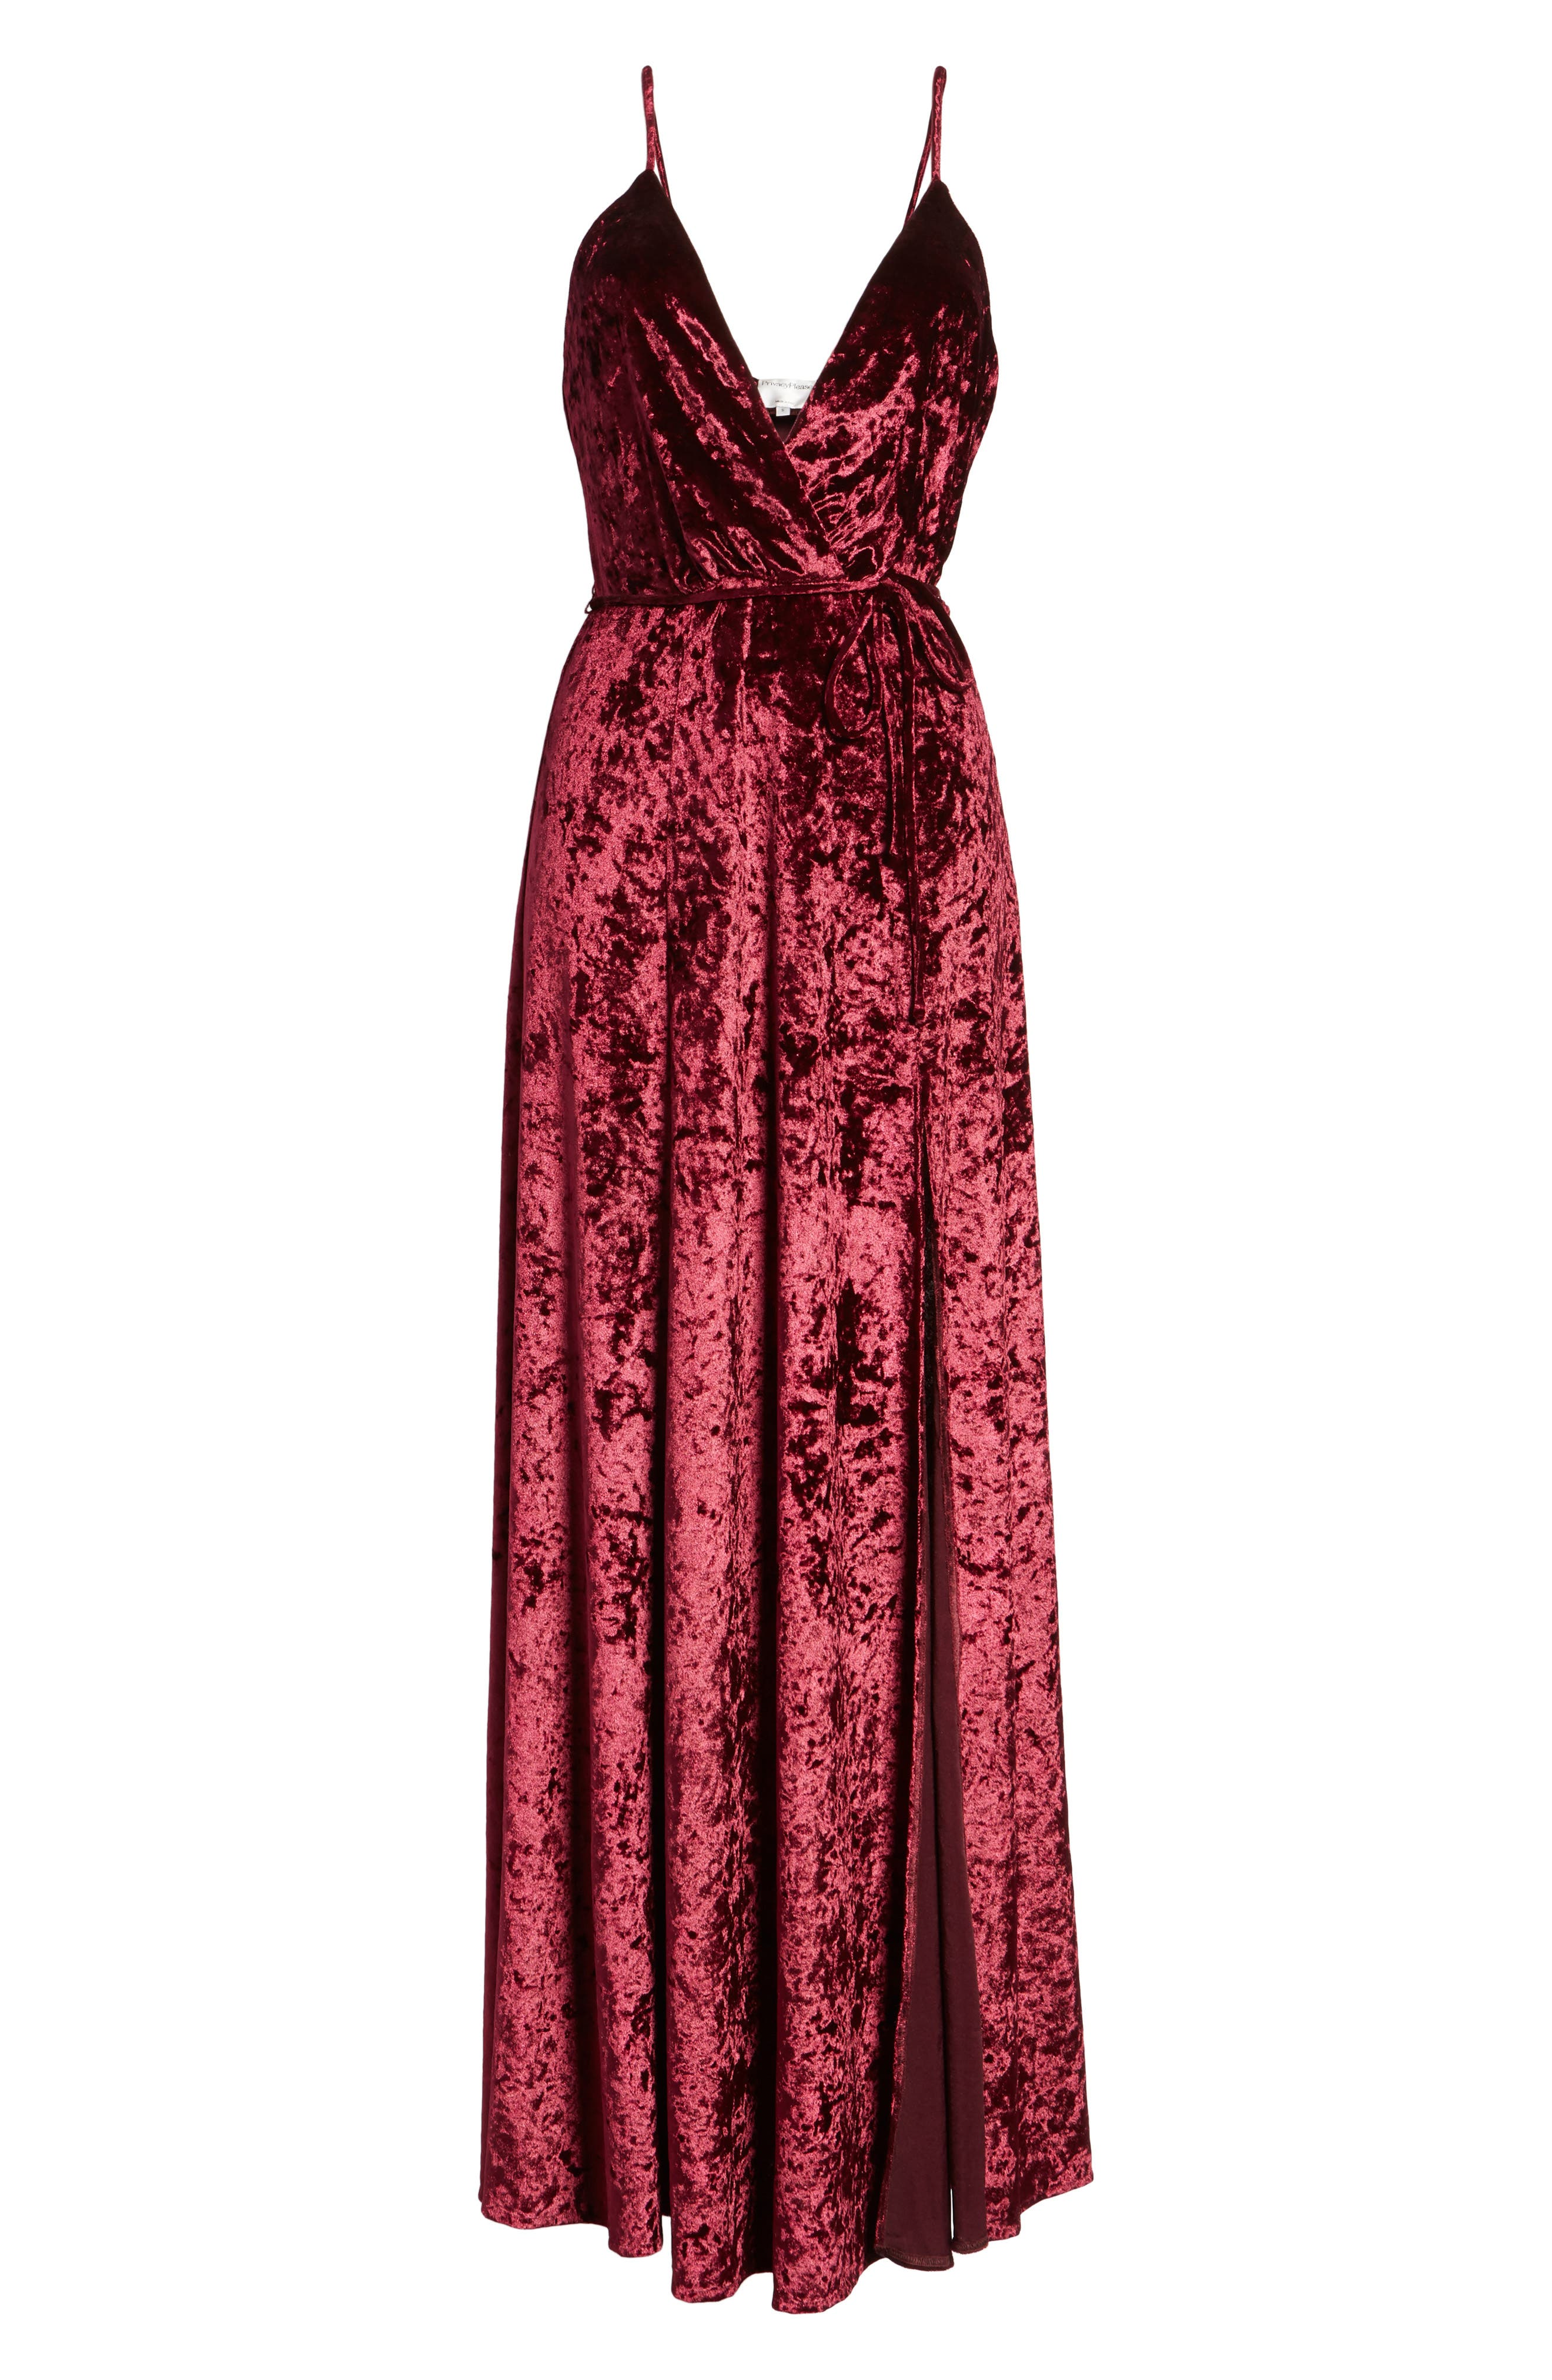 Crenshaw Maxi Dress,                             Alternate thumbnail 6, color,                             Bordeaux